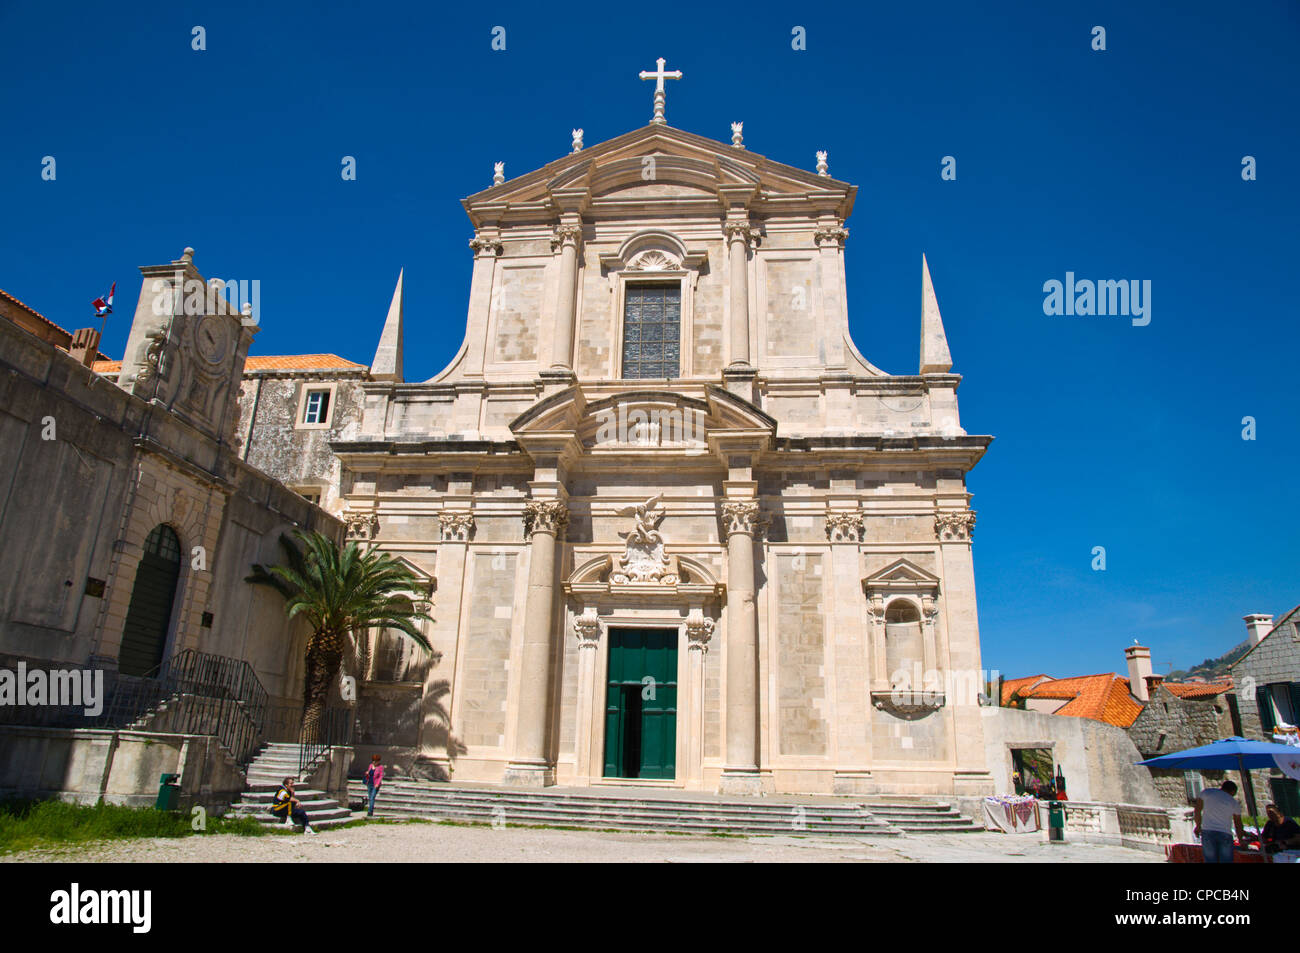 Isusovačka crkva the Jesuit church Grad the old town Dubrovnik city Dalmatia Croatia Europe - Stock Image